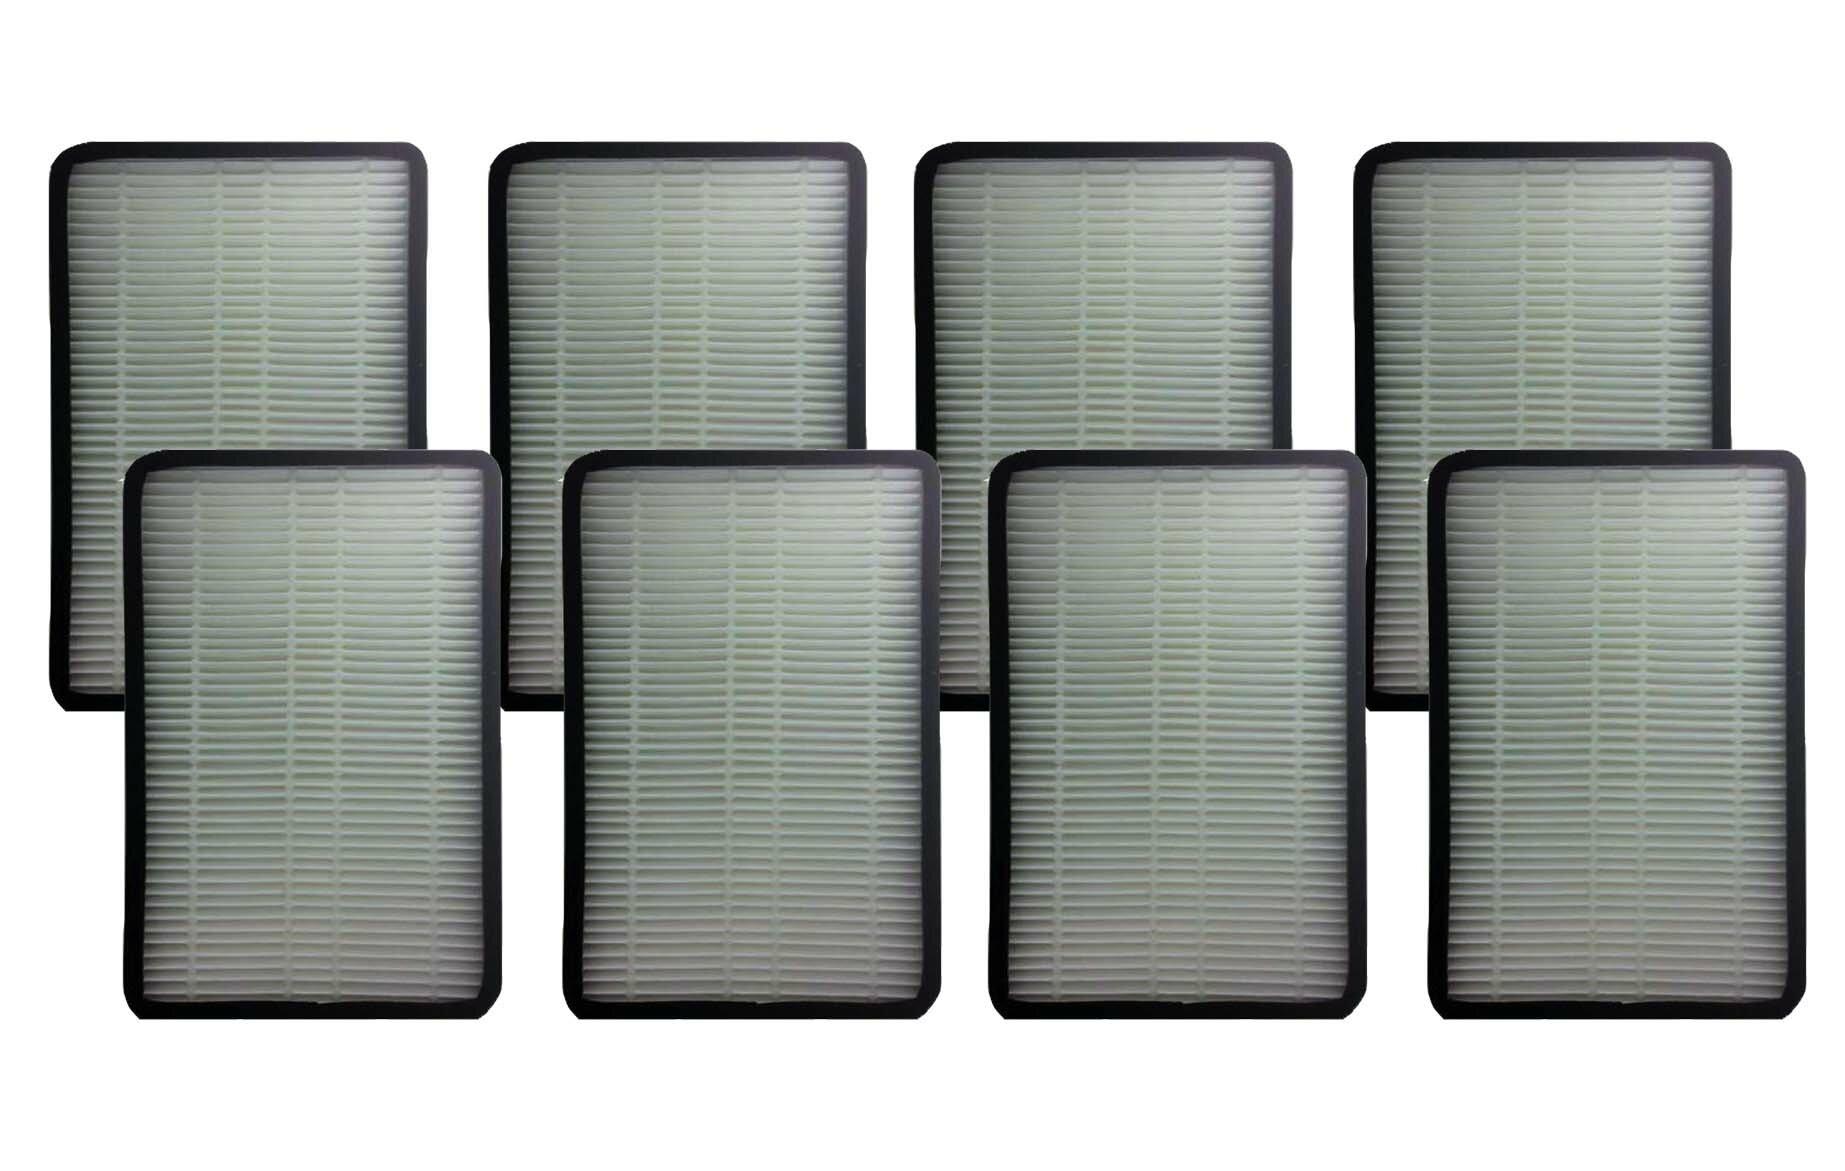 Crucial Think Crucial Kenmore Ef1 Hepa Exhaust Vacuum Filter Wayfair